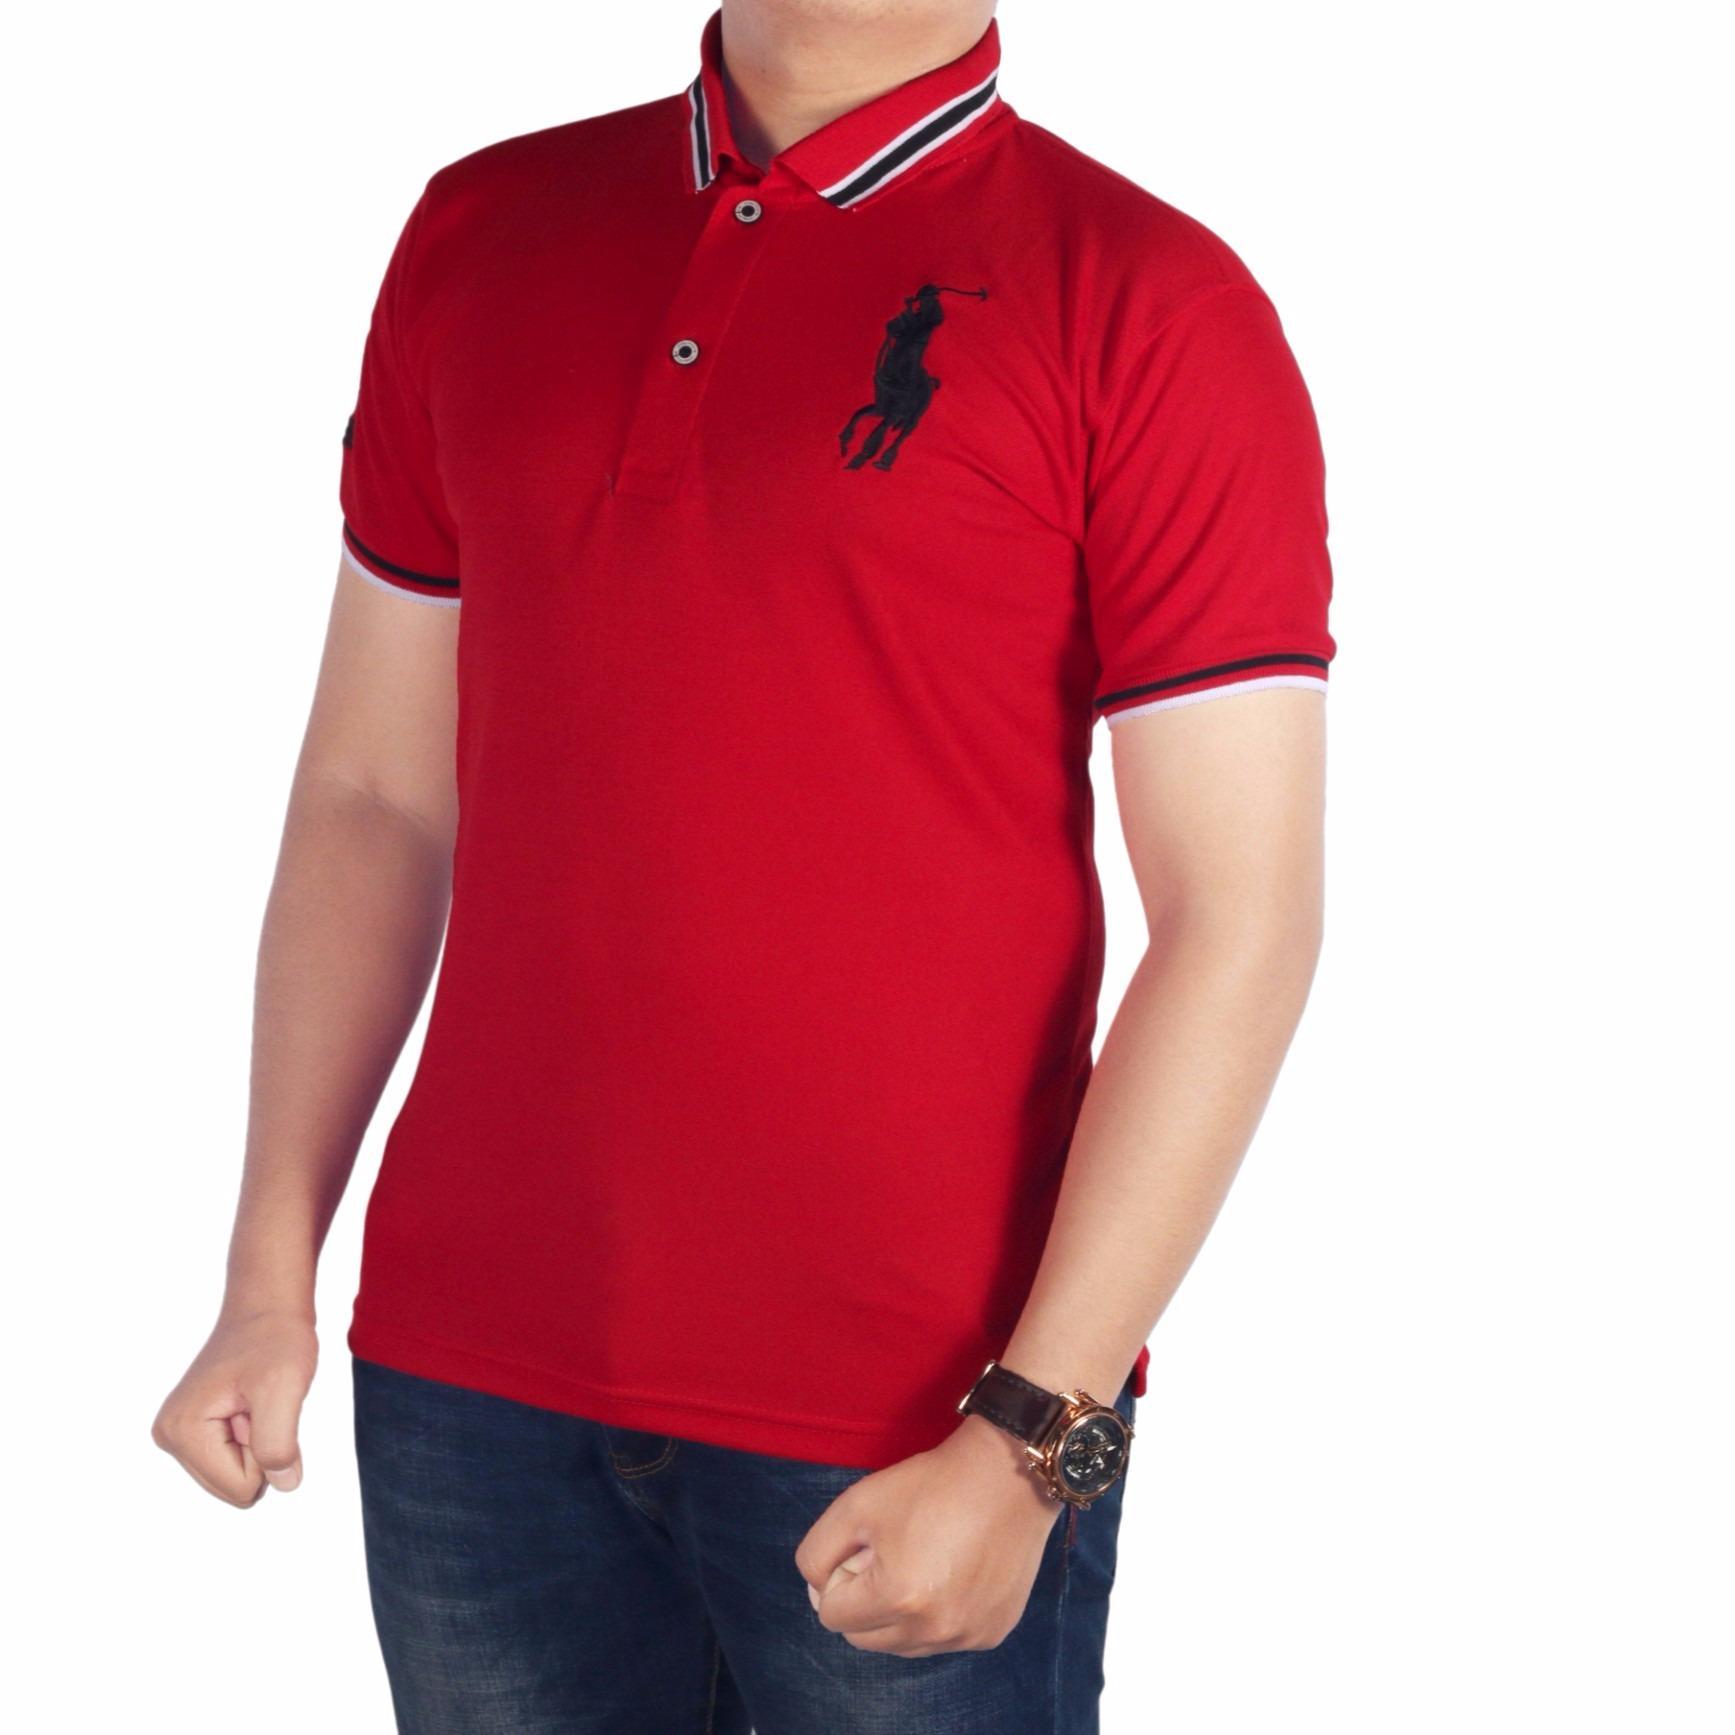 Spek Dgm Fashion1 Polo Shirt Polos Merah Kaos Polo Pria Poloshirt Man Polo Kaos Kaos Baseball Putih Kaos Distro Kaos Casual Kaos Polos Kaos Oblong Kaos Man T Shirt Man Pl 4544 Merah Dki Jakarta